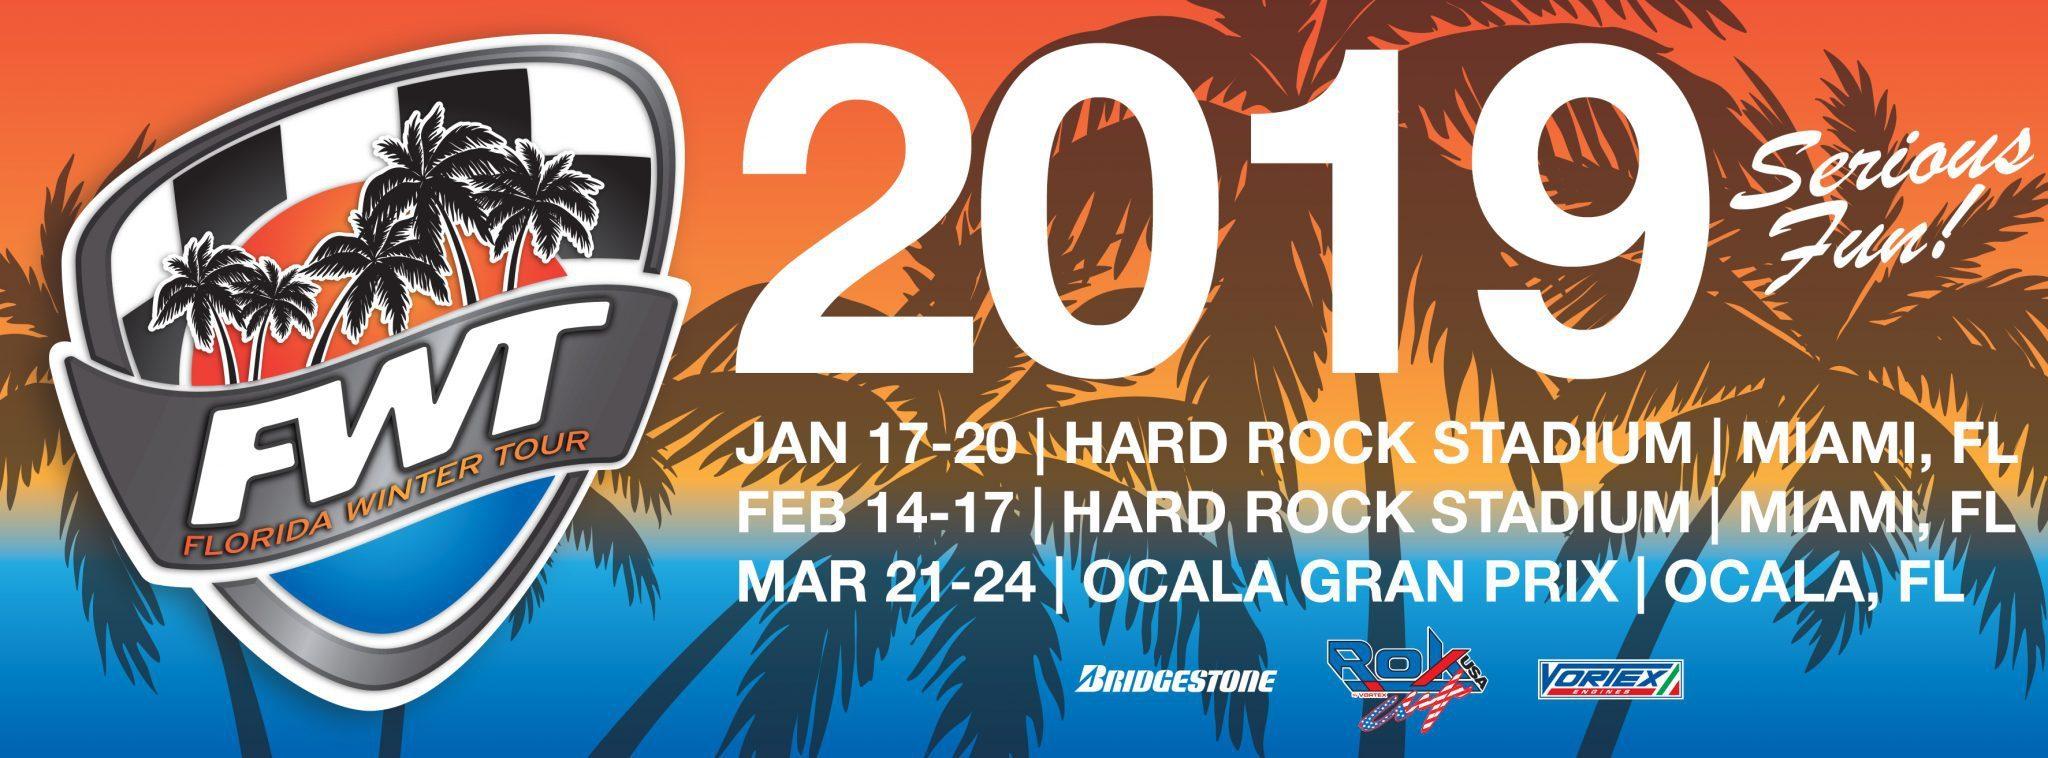 2019 Florida Winter Tour Photo Package - 1 Race 00011